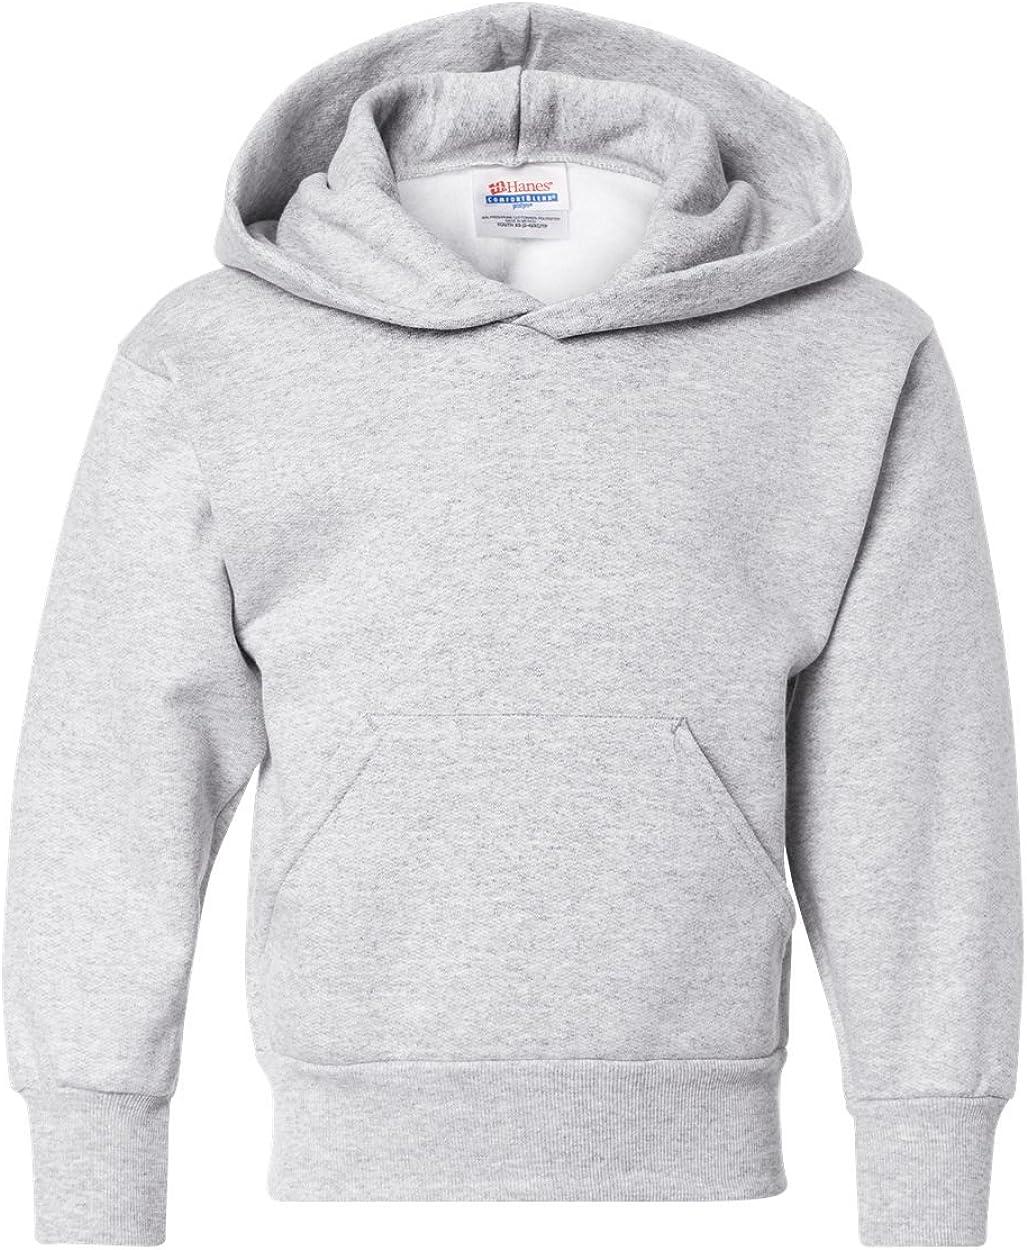 Hanes Big Boy's Hooded Pullover Sweatshirt, Ash, Large